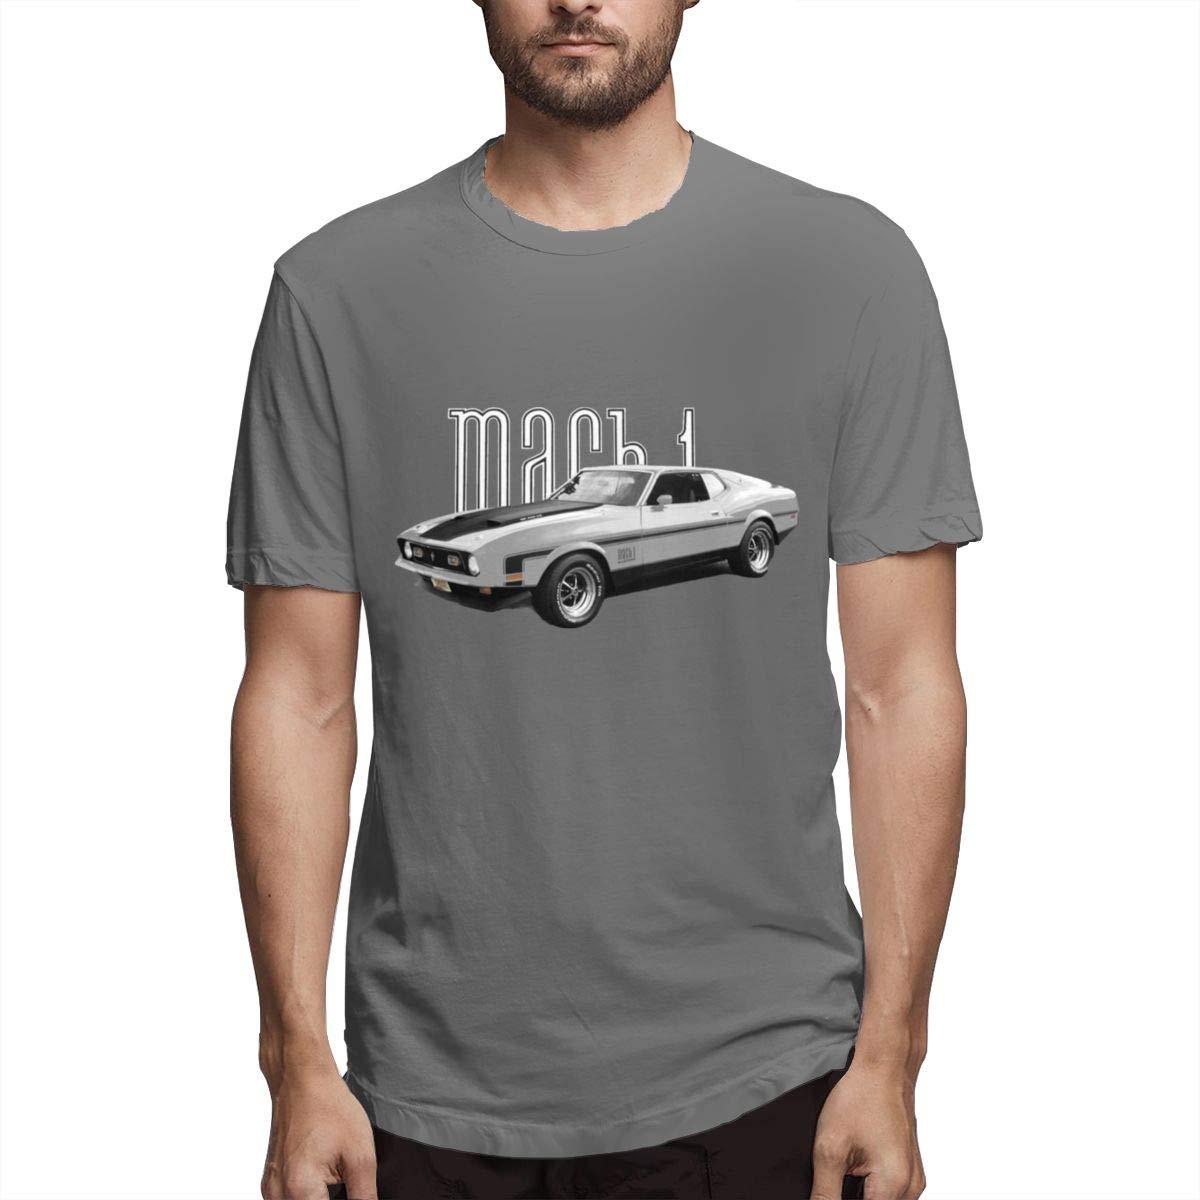 Seuriamin Silver 1972 Mach 1 Mustang S Comfortable Jogging Short Sleeve T Shirt